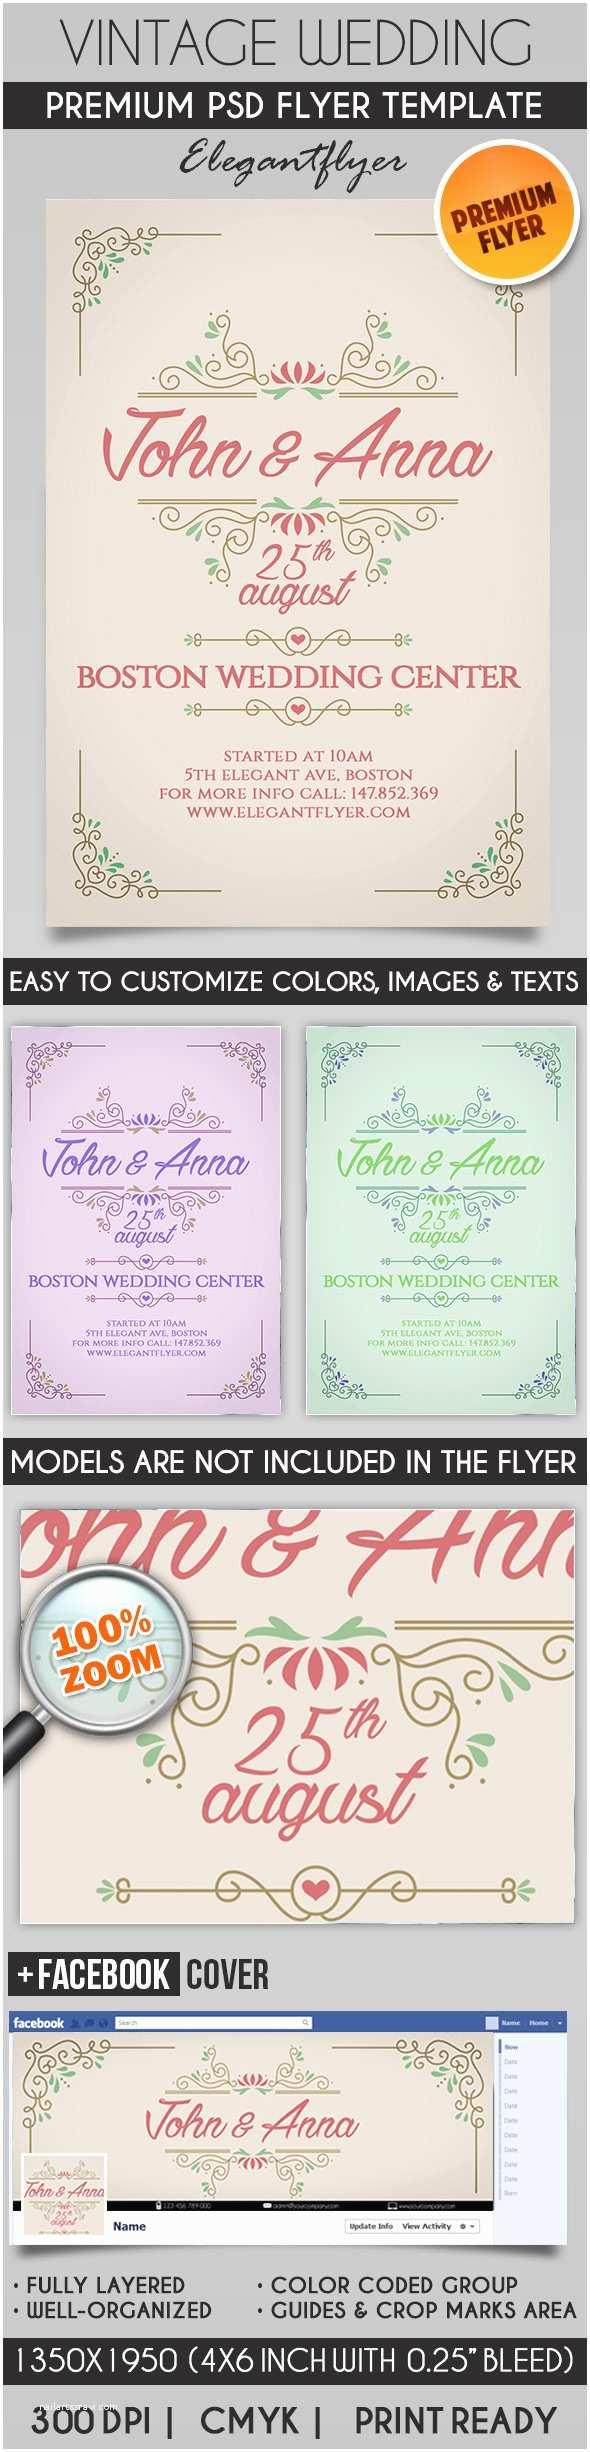 Wedding Invitation Flyer Template Vintage Wedding Invitation – Flyer Psd Template – by